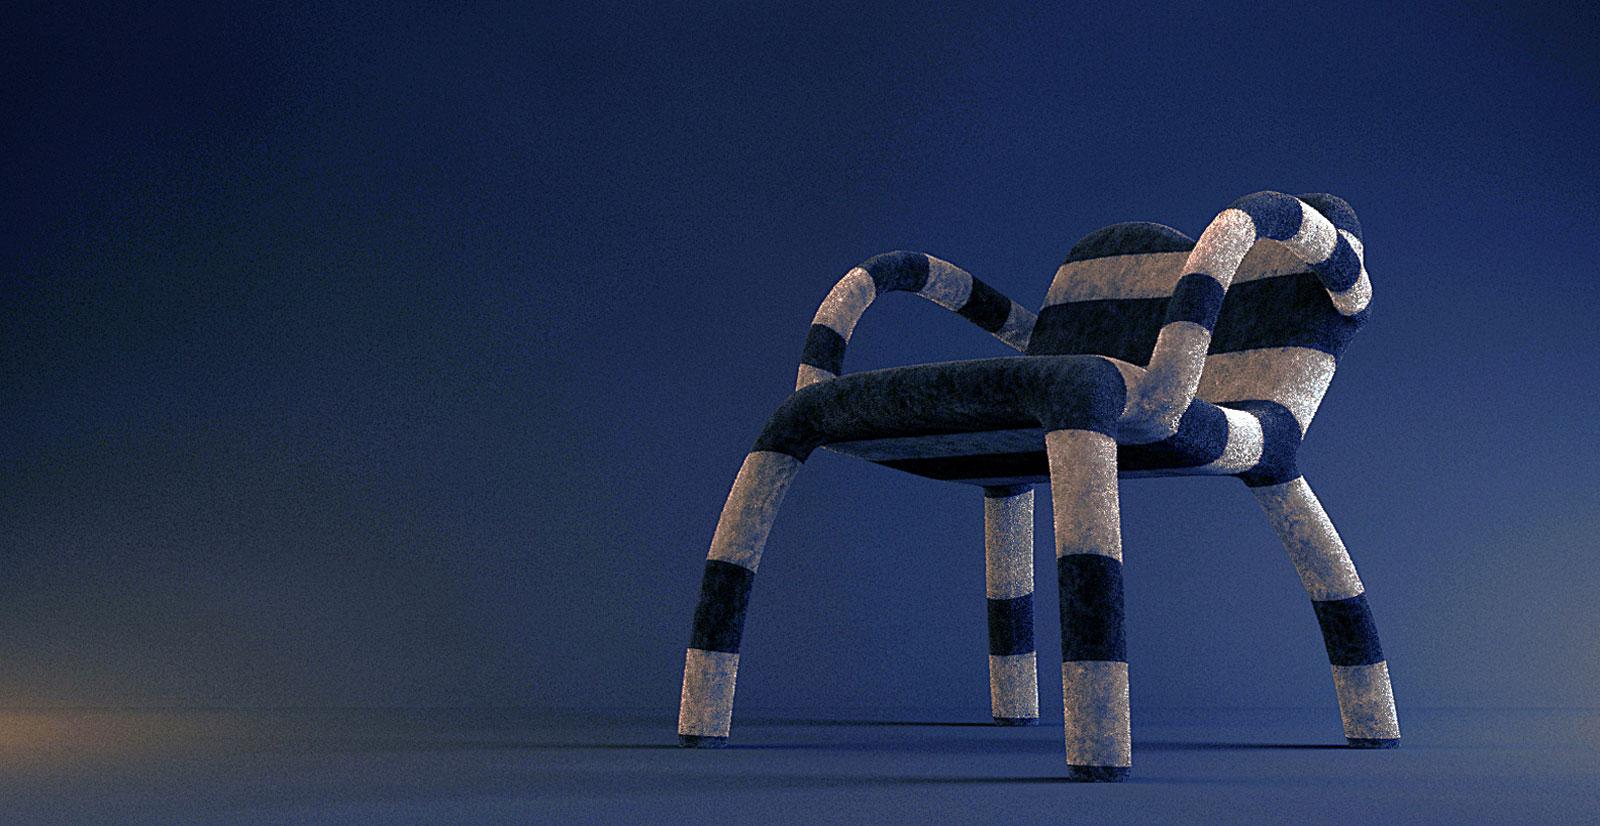 Bertjan Pot's Jumper chair